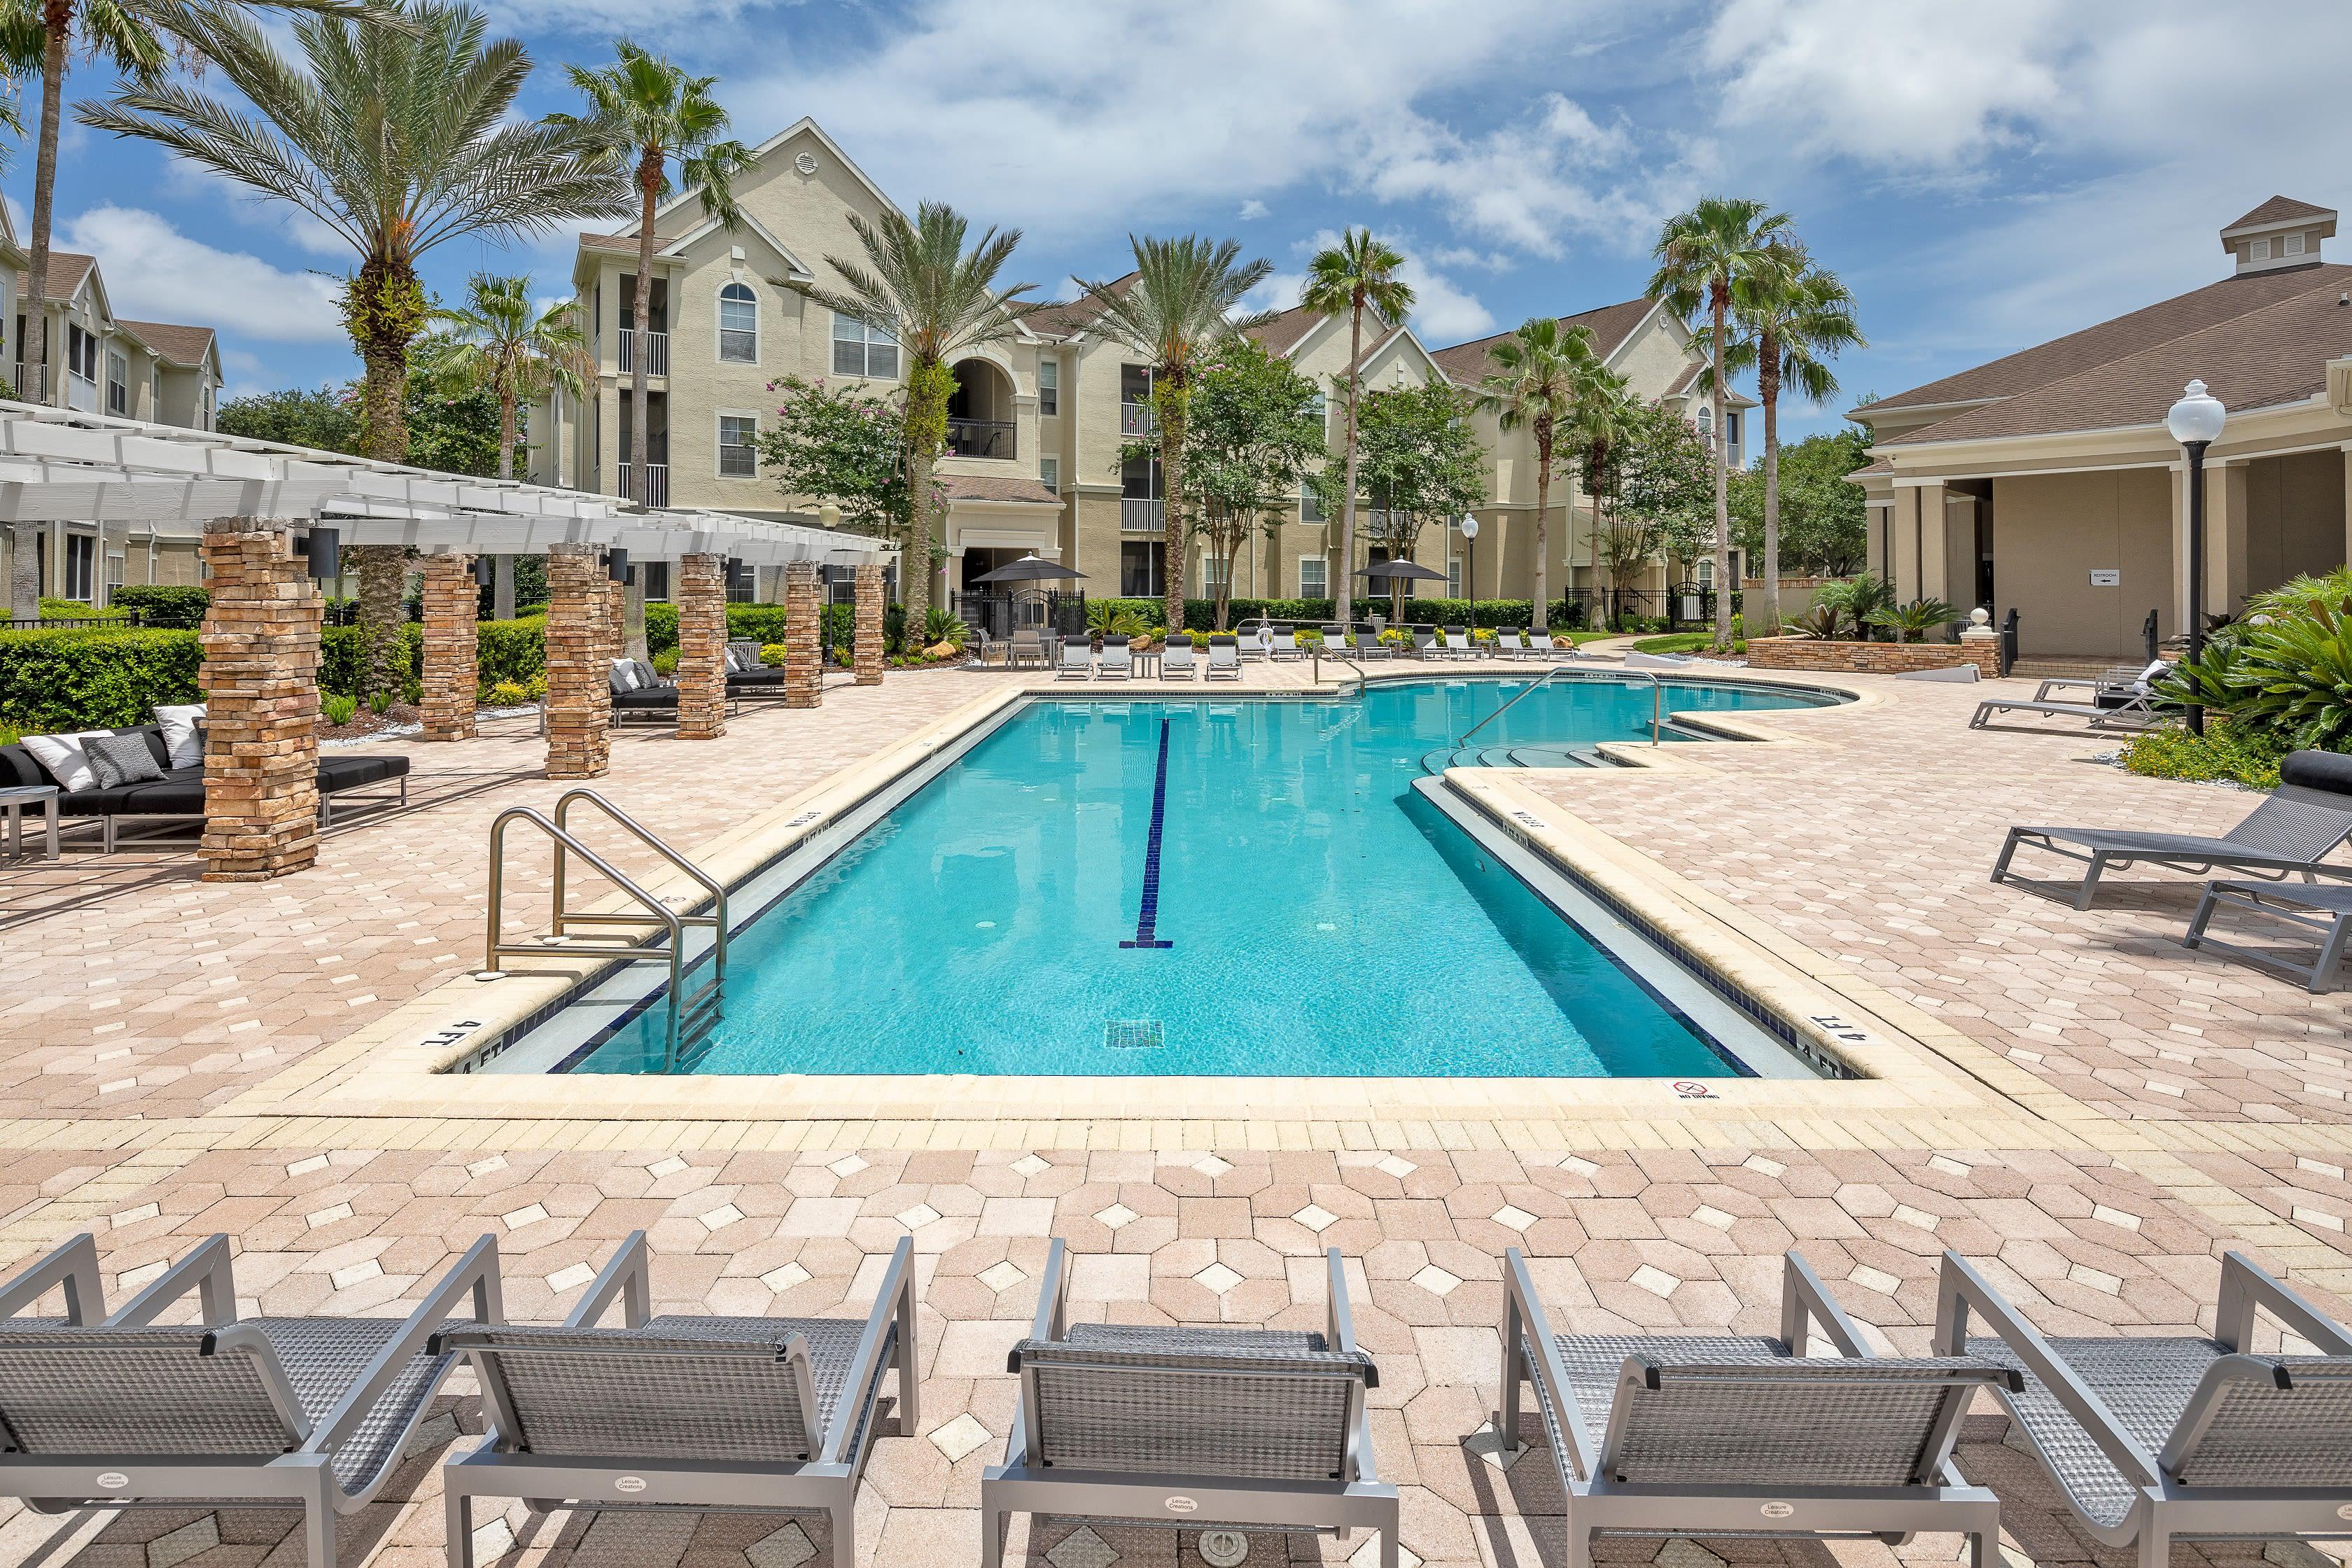 Beautiful pool in Jacksonville, Florida at Eddison at Deerwood Park